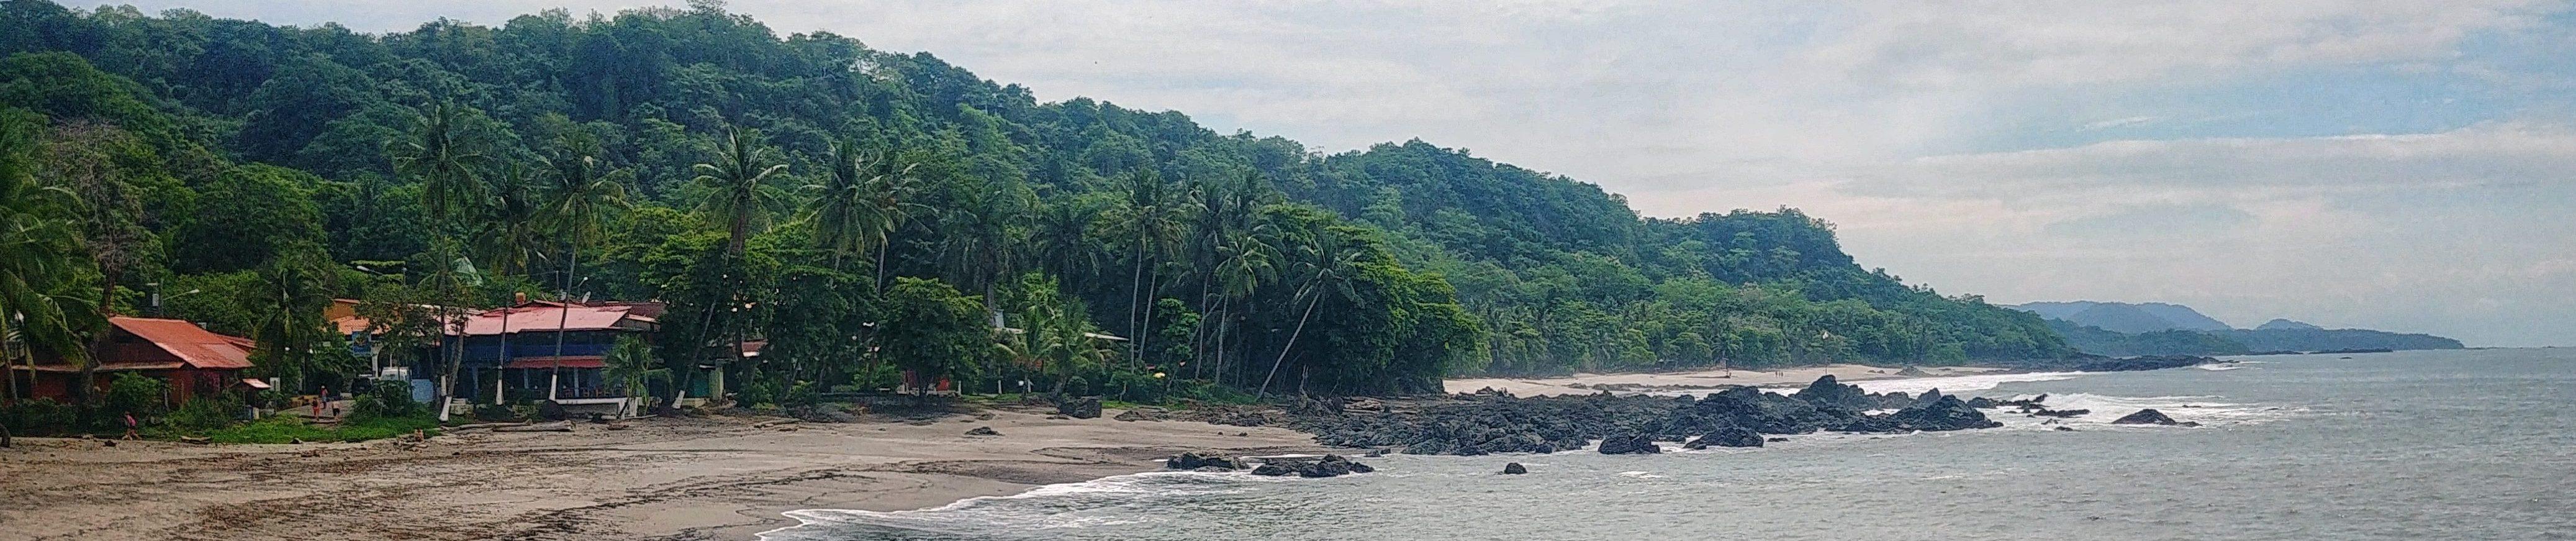 montezuma plage nicoya costa rica voyage sable surf quelle saison période